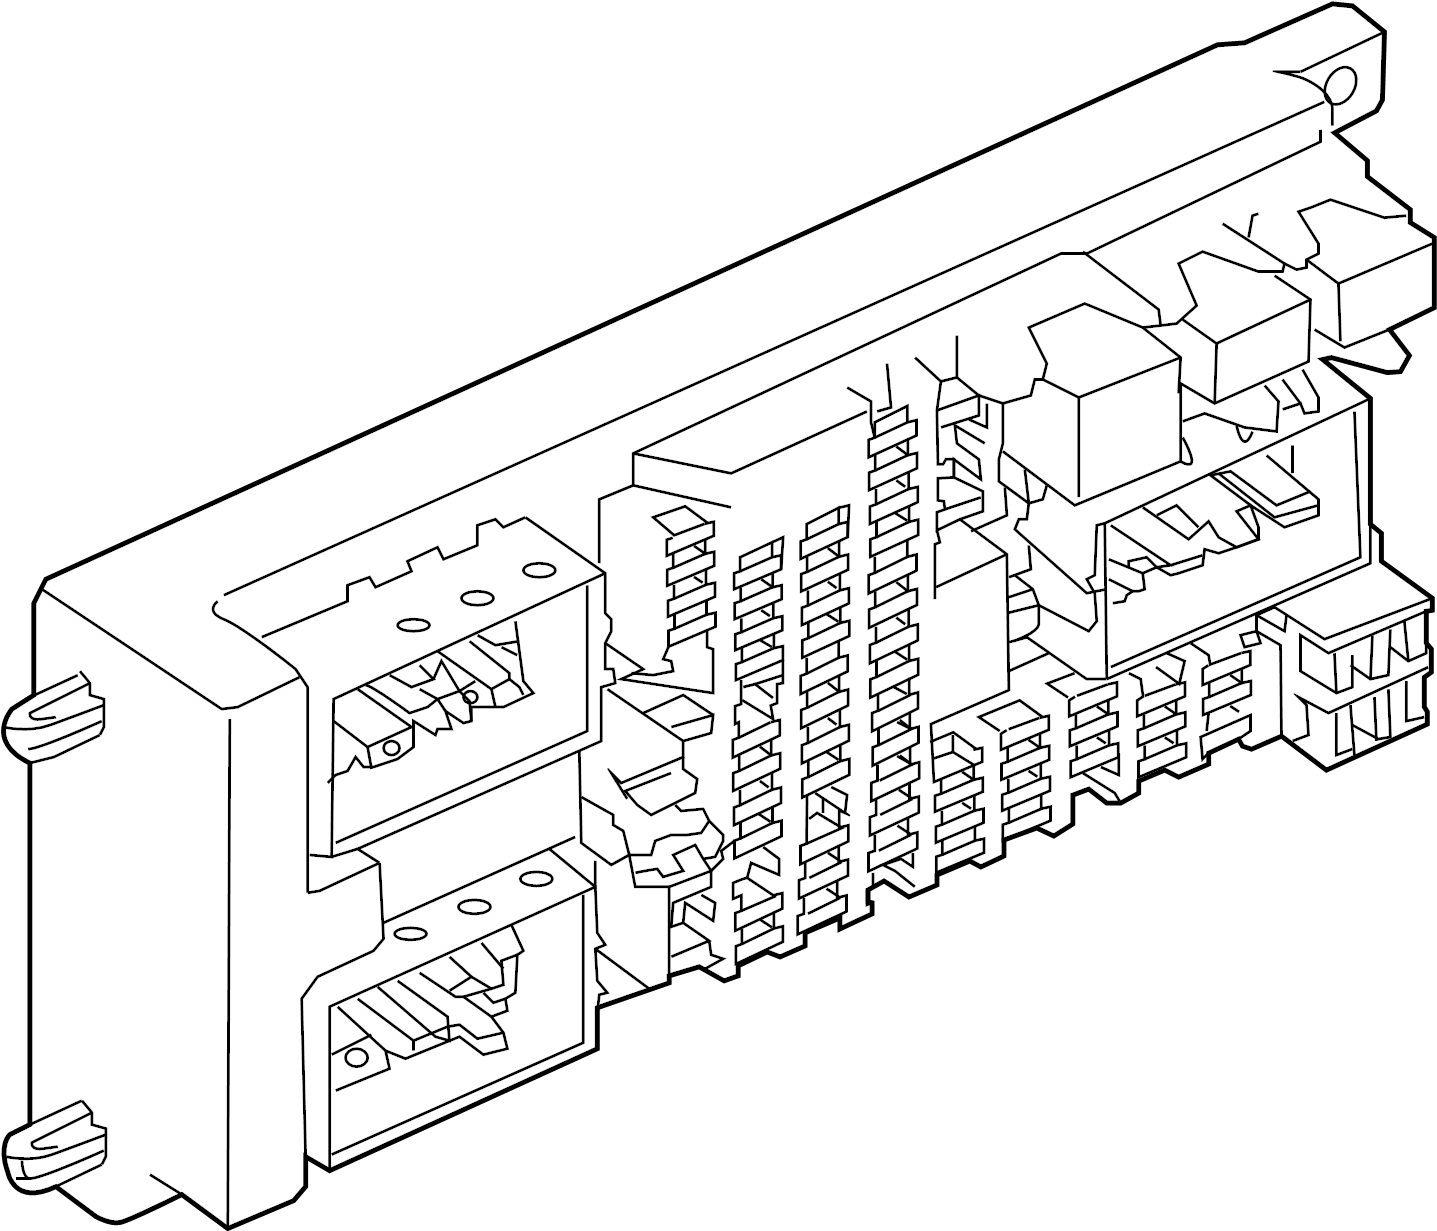 2012 Land Rover Range Rover Fuse Box  Instrument Panel